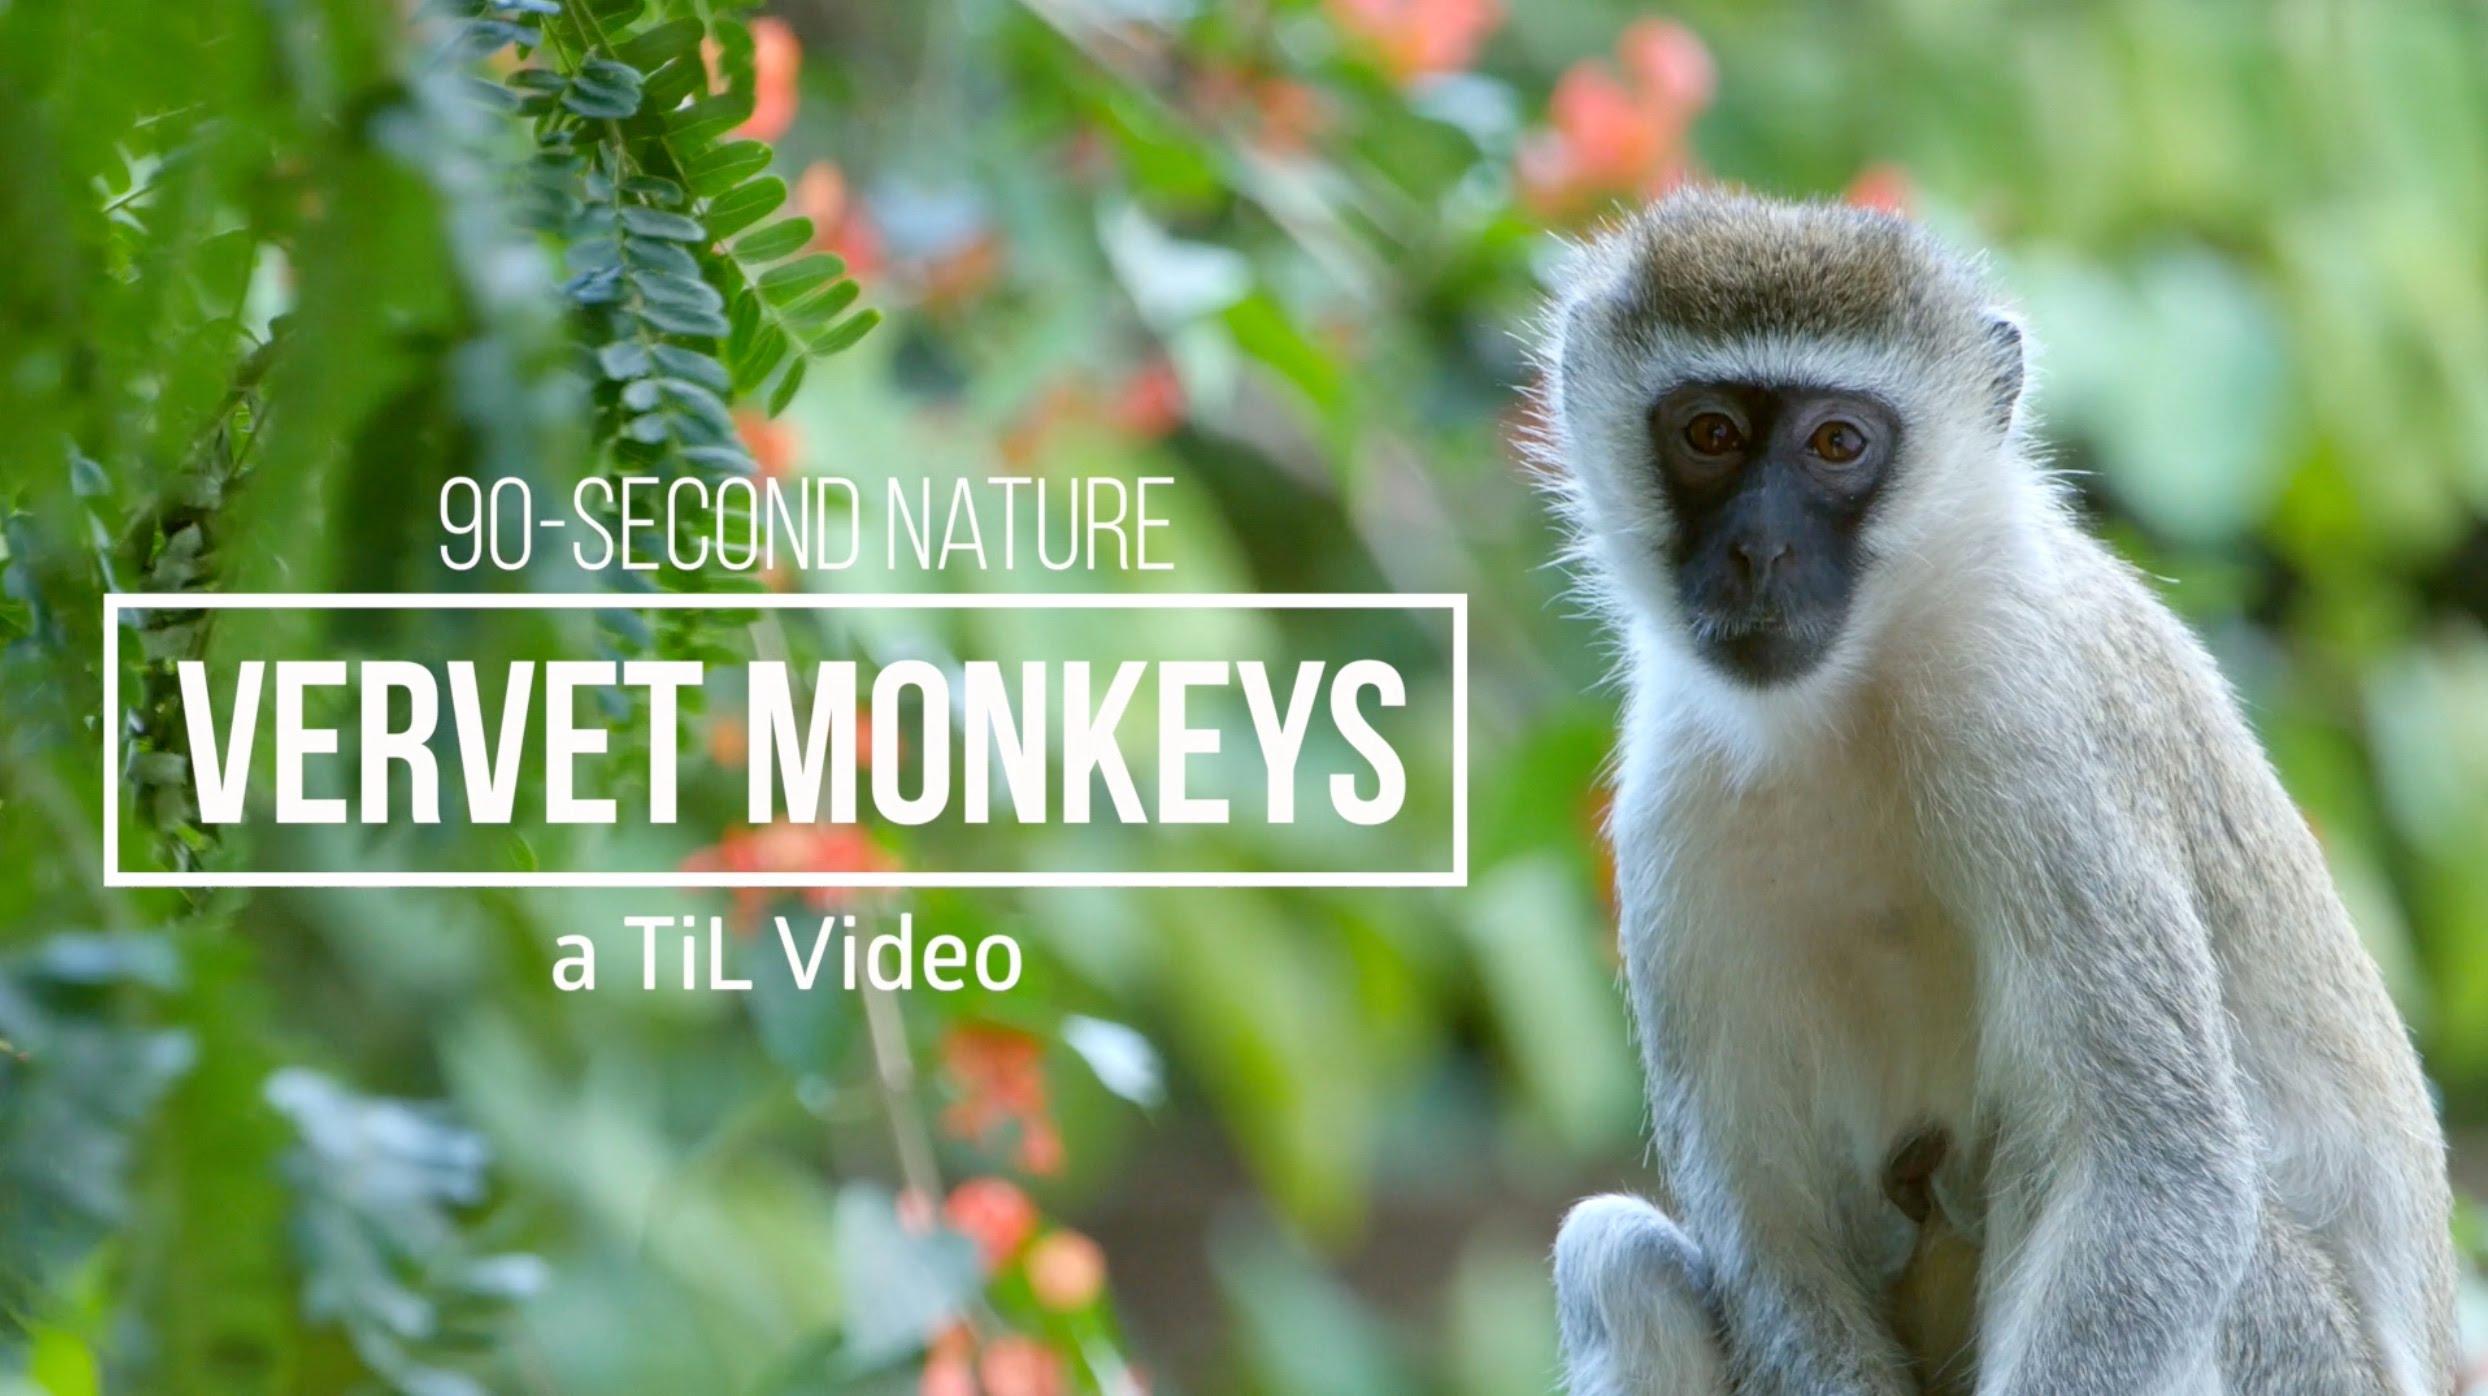 Meet the Vervet Monkey: a 90-Second Nature Film - YouTube